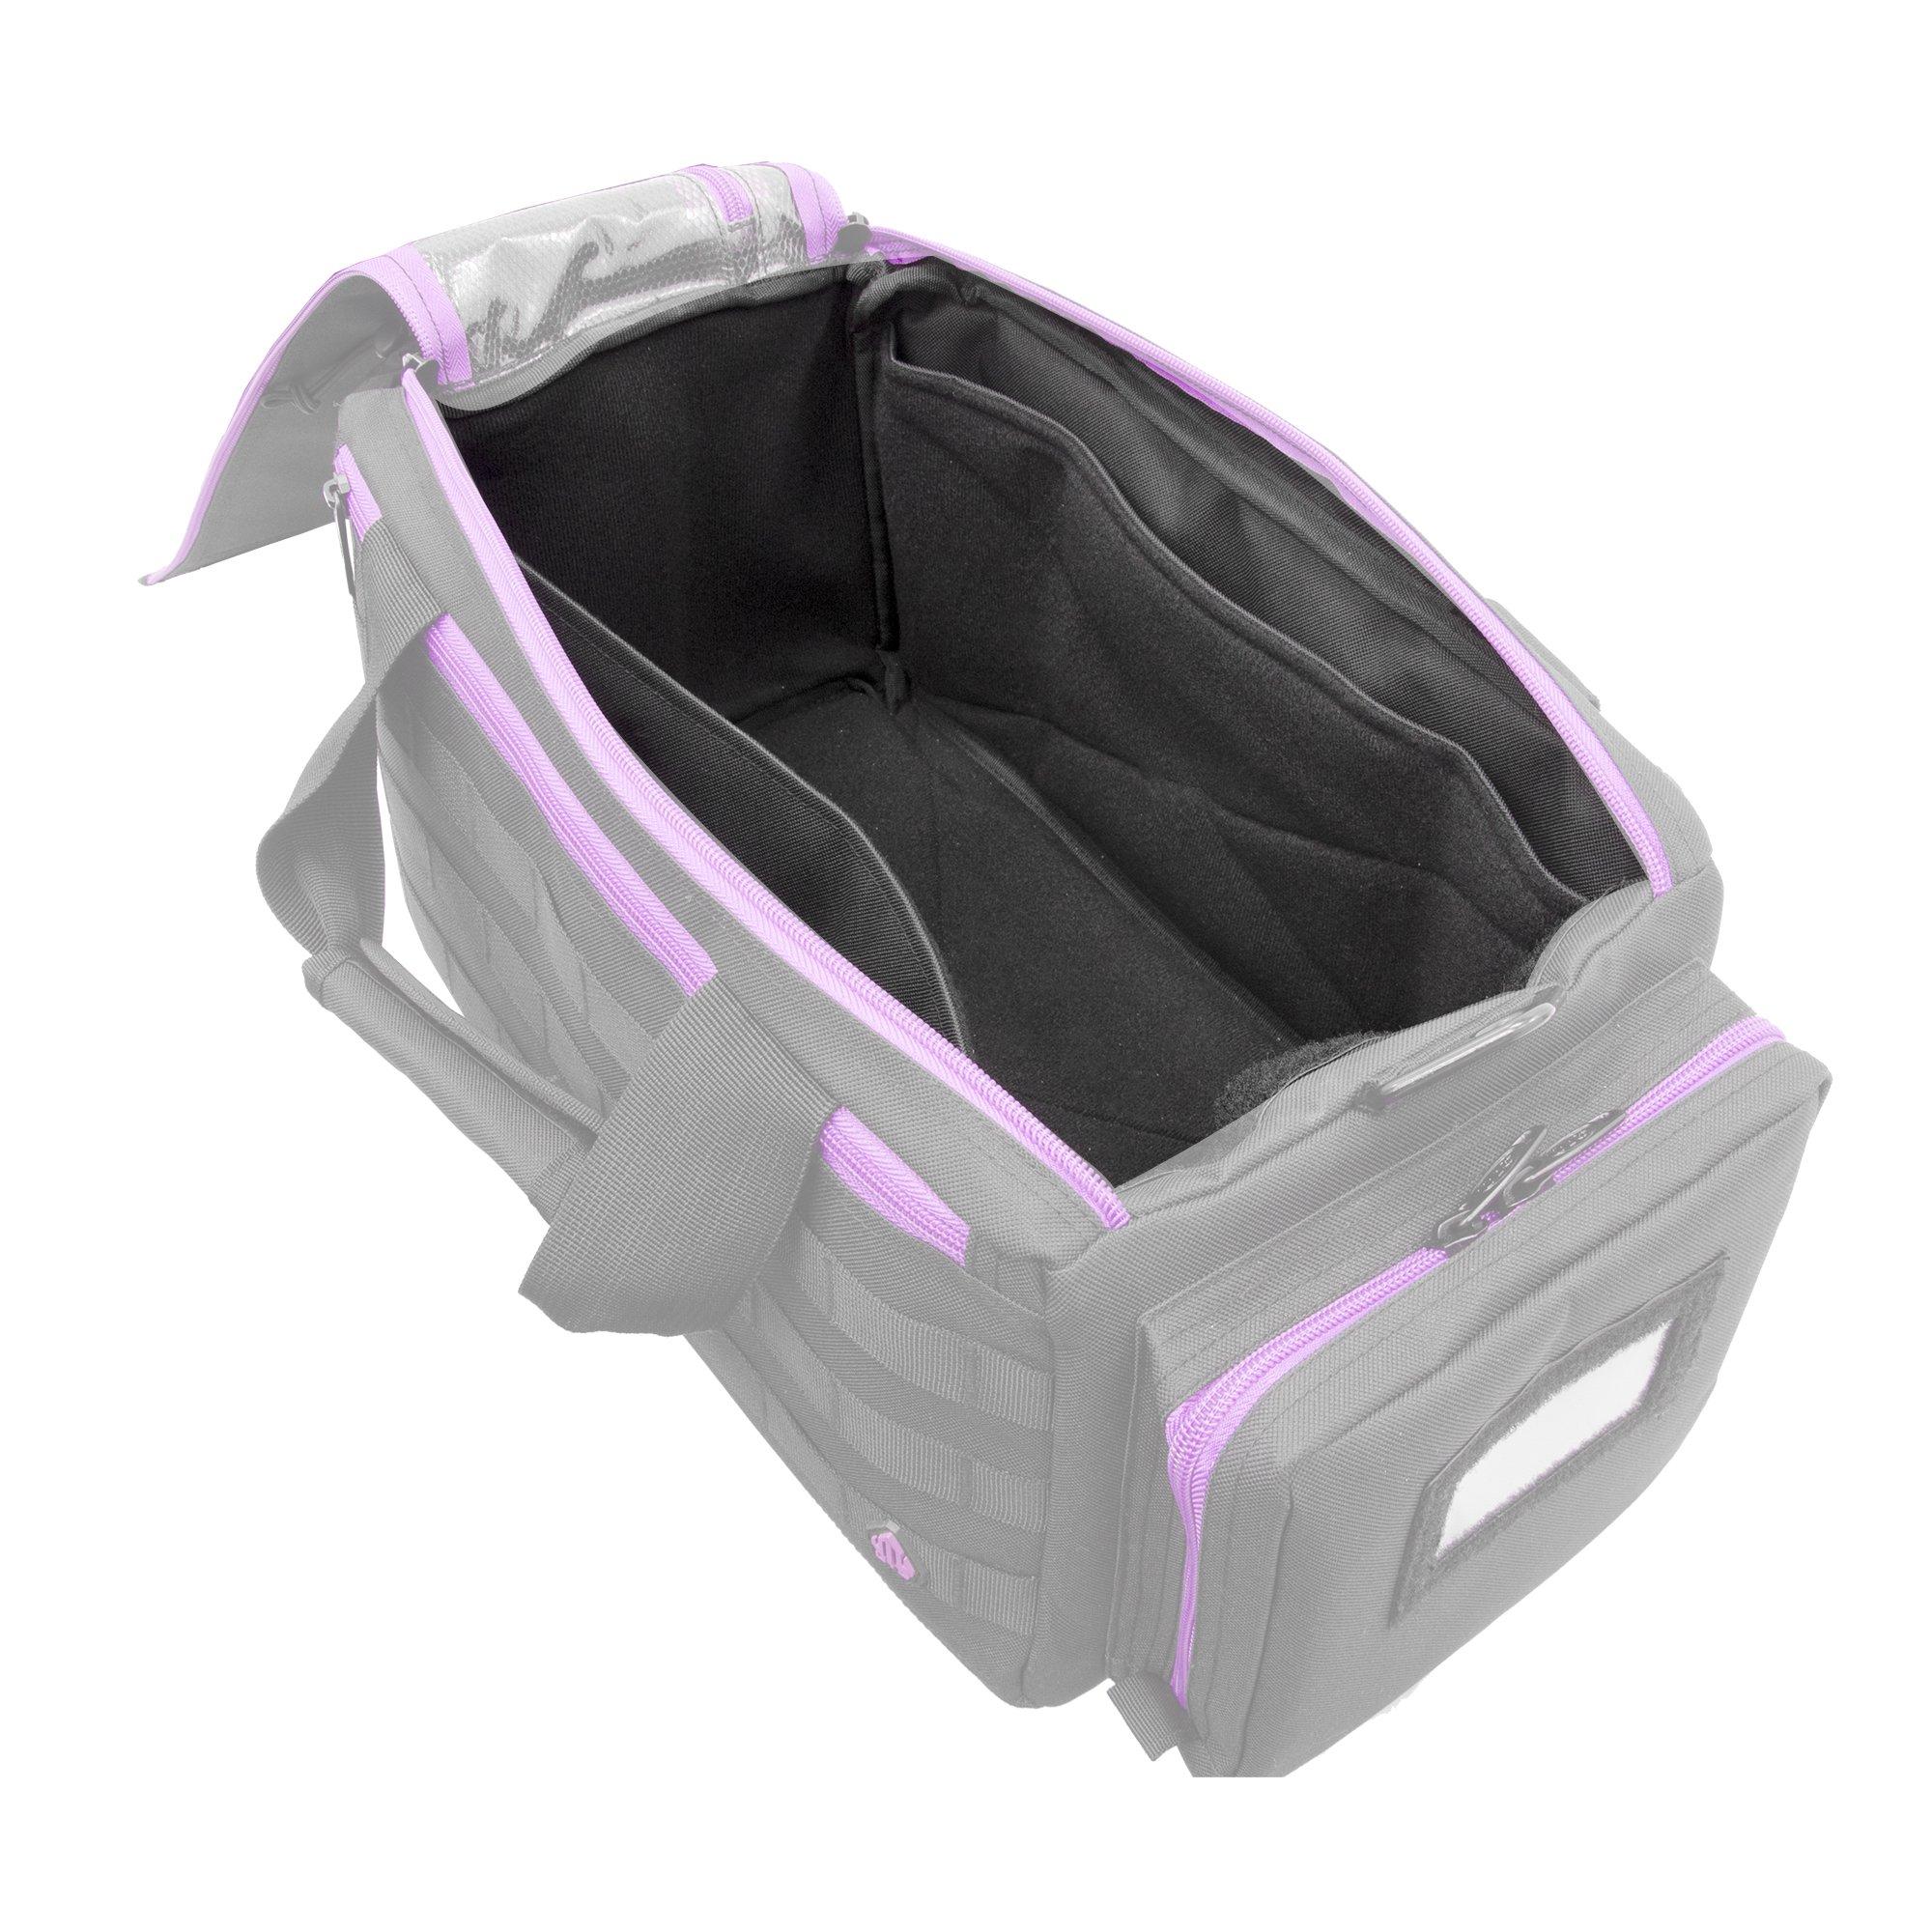 UTG All in One Range/Utility Go Bag, Black/Violet, 21'' x 10'' x 9'' by UTG (Image #8)